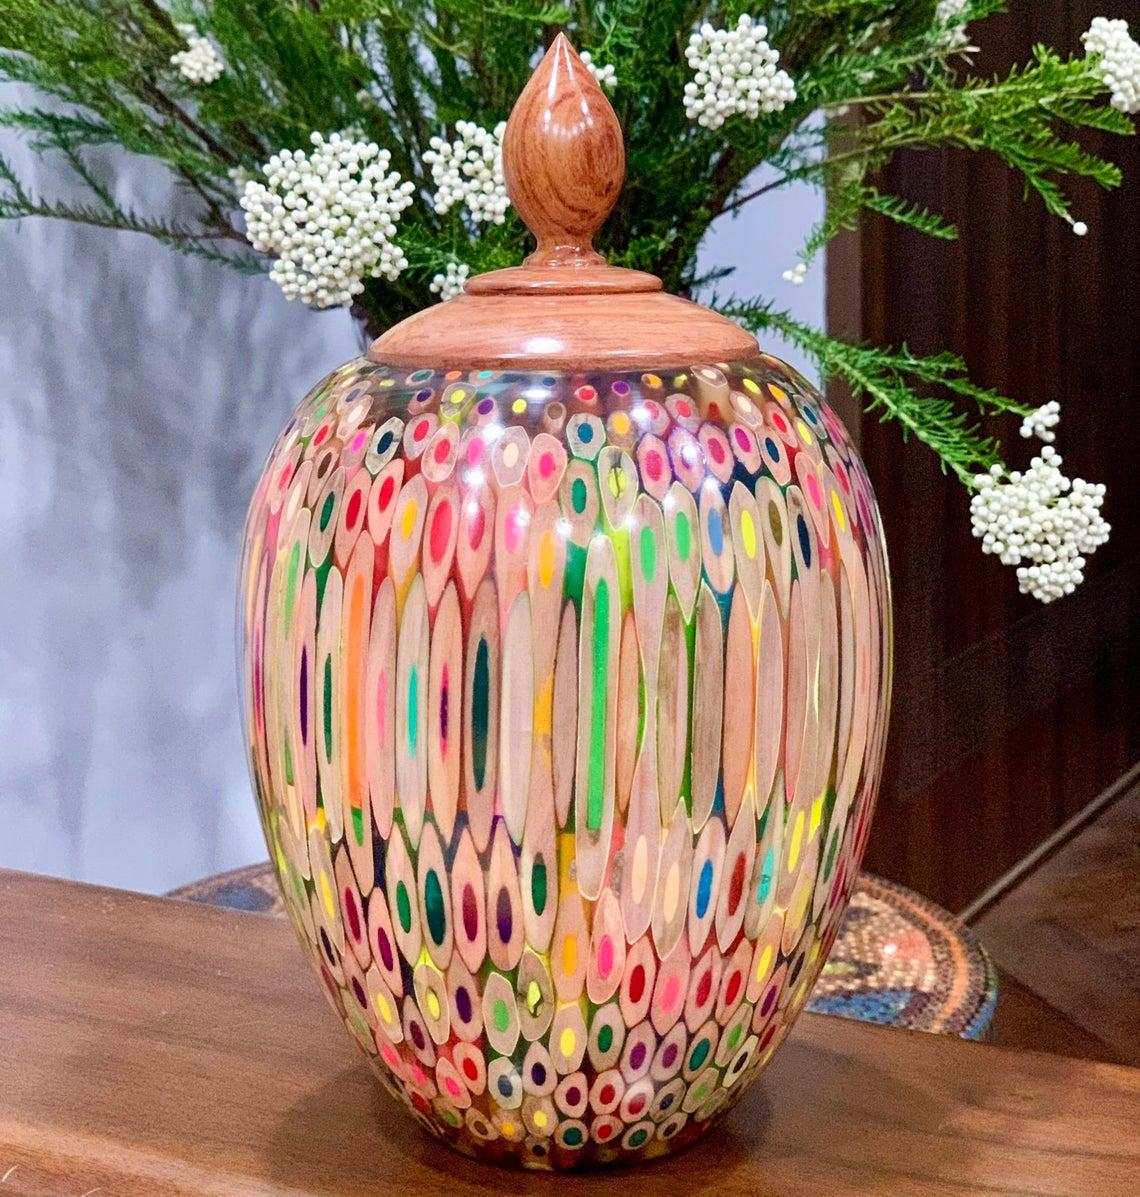 Decorative Colored-pencil Heirloom Vase